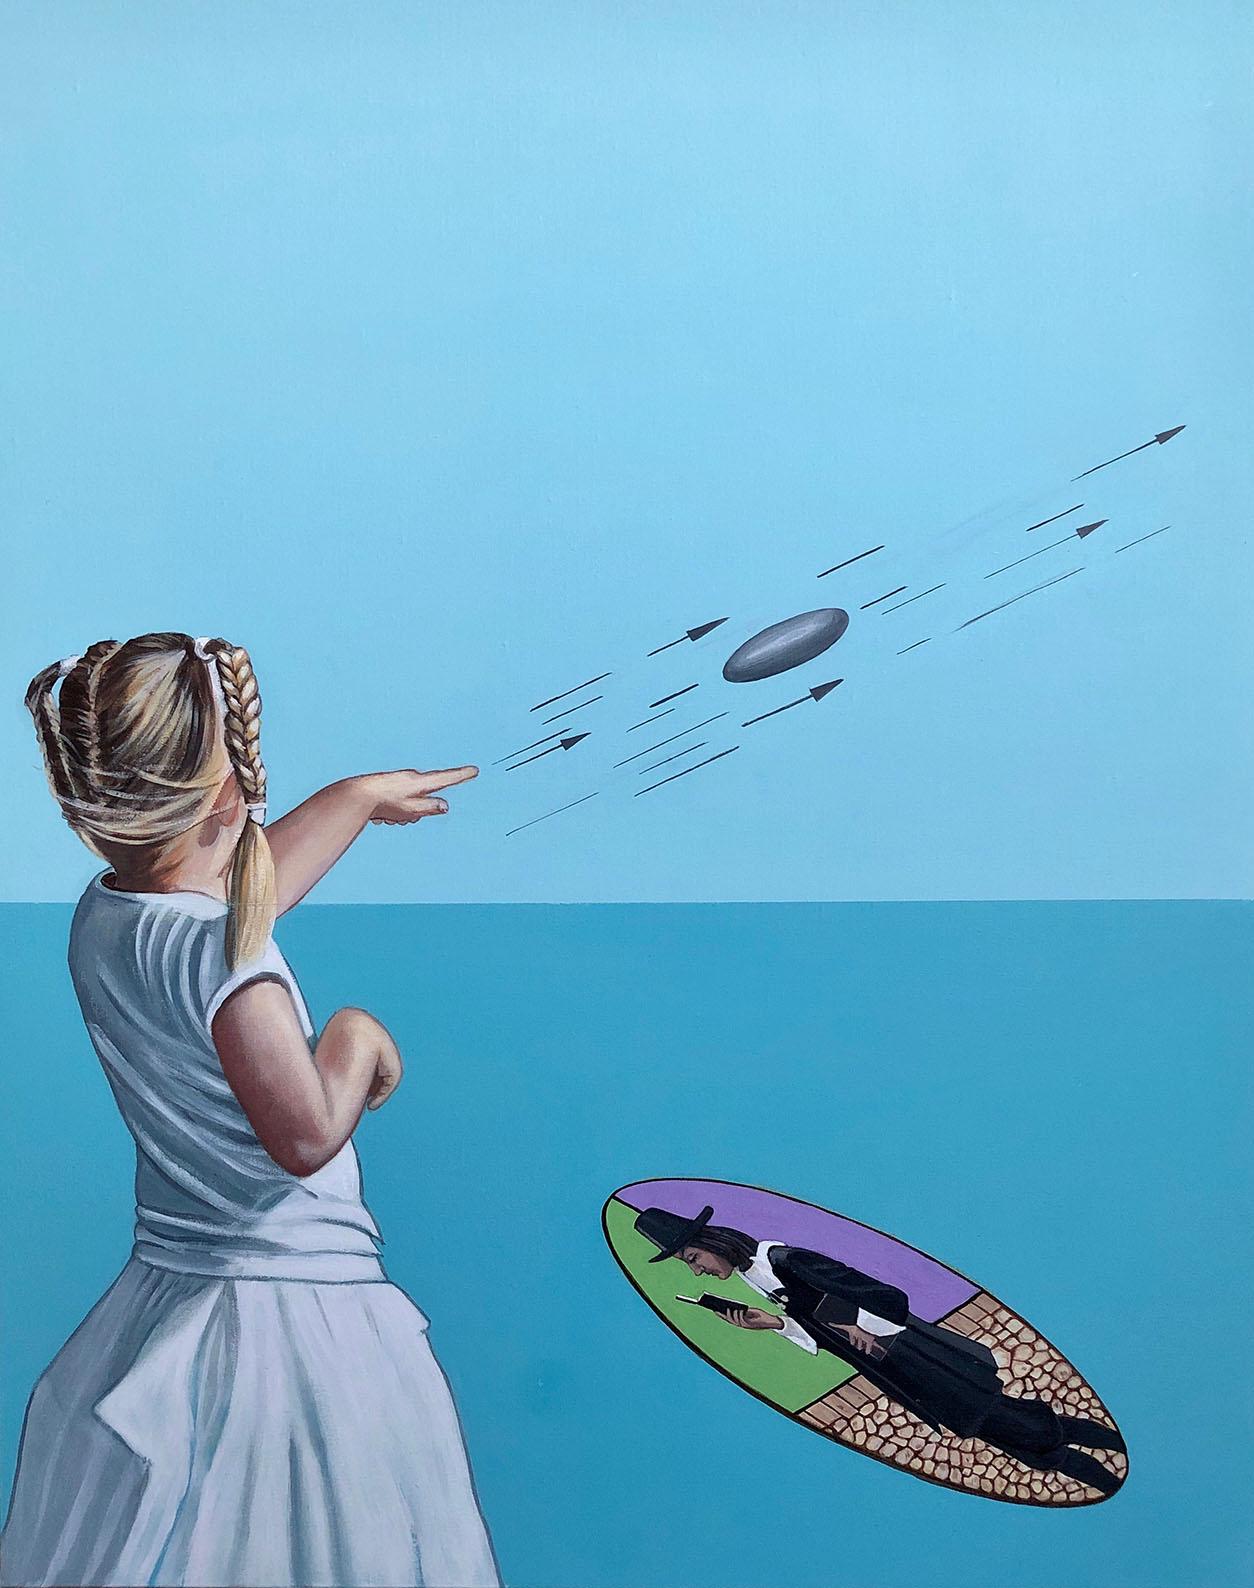 Cristina Ruiz Guinazu, La pierre, acrylics on canvas, 92 x 73 cm, 2019